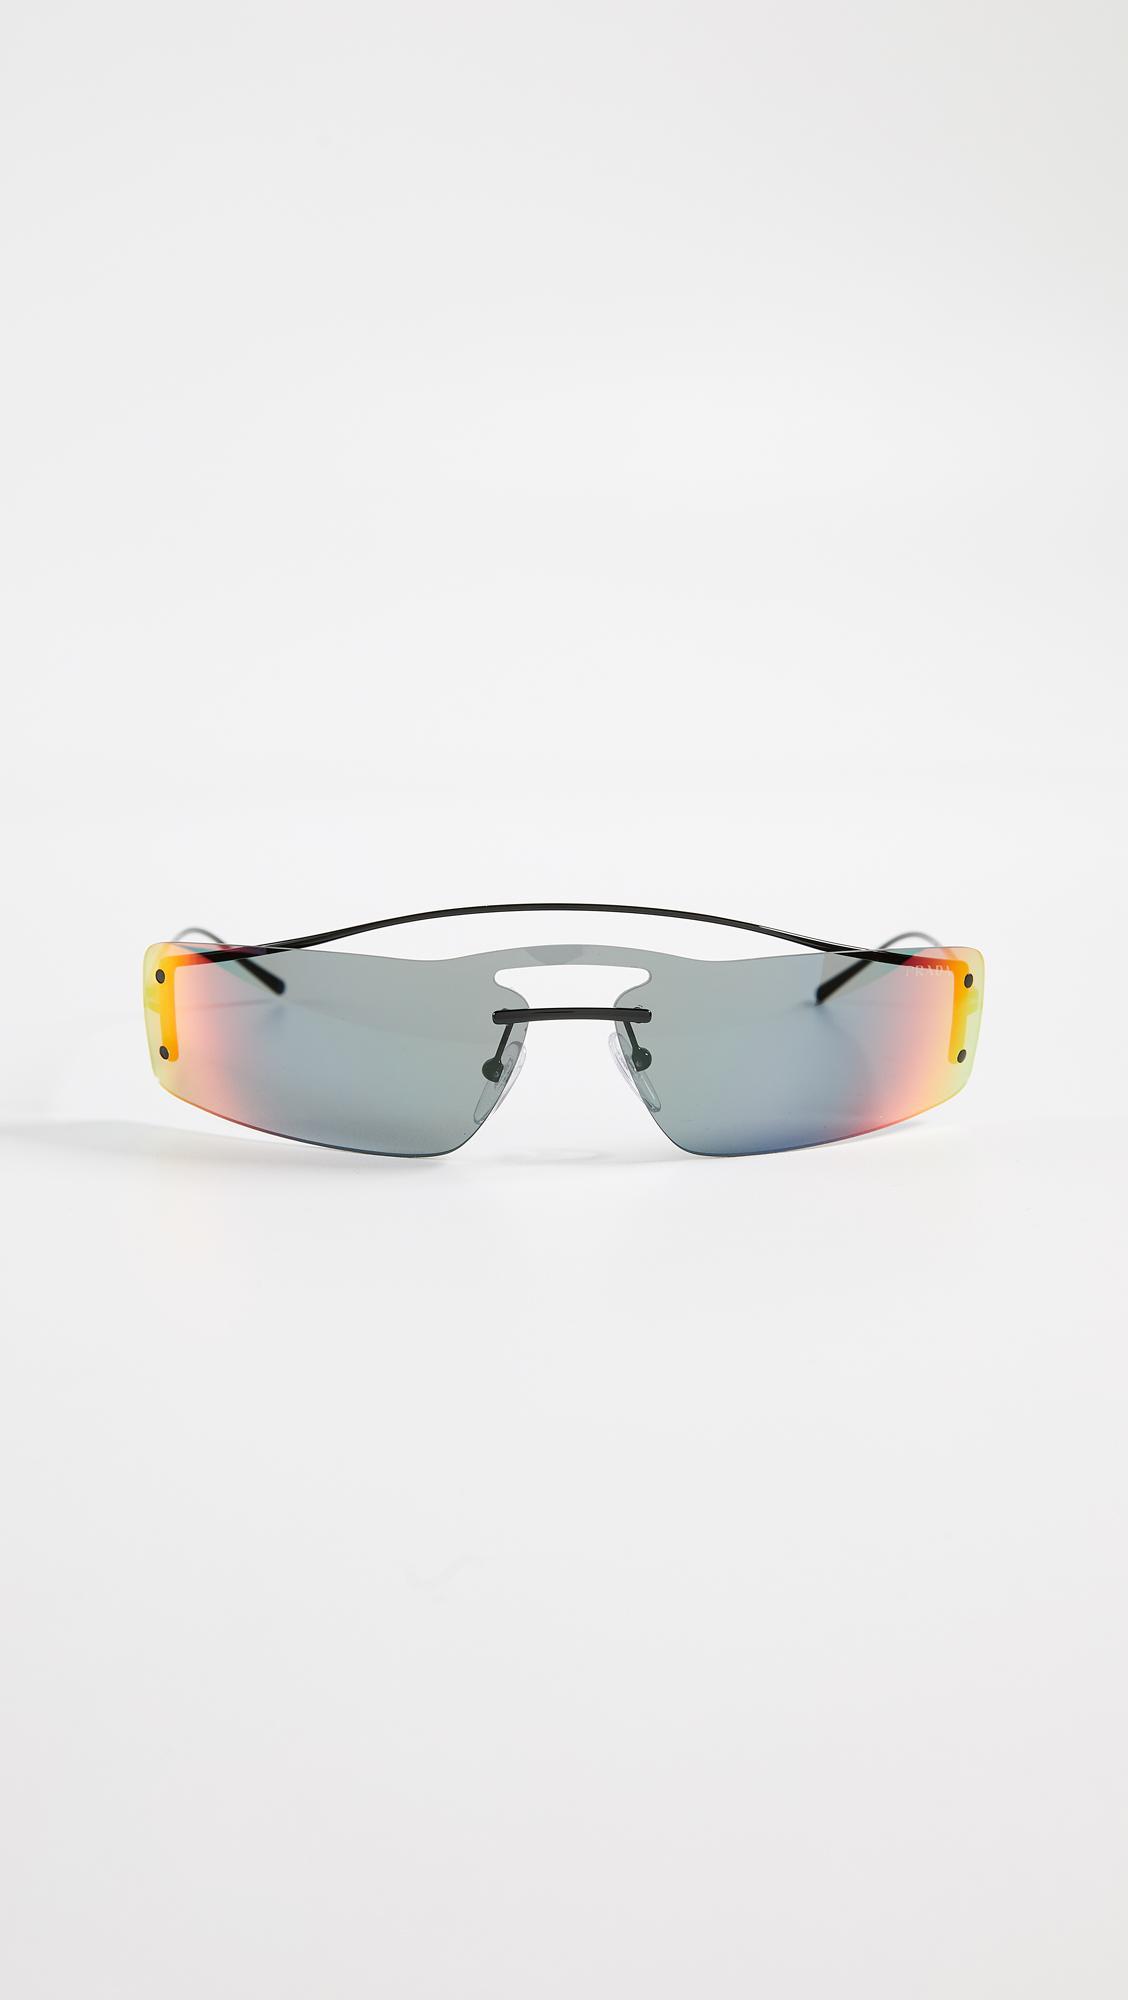 0611807d04 Prada. Women s Pr 61vs Runway Rainbow 90 s Skinny Rectangle Sunglasses